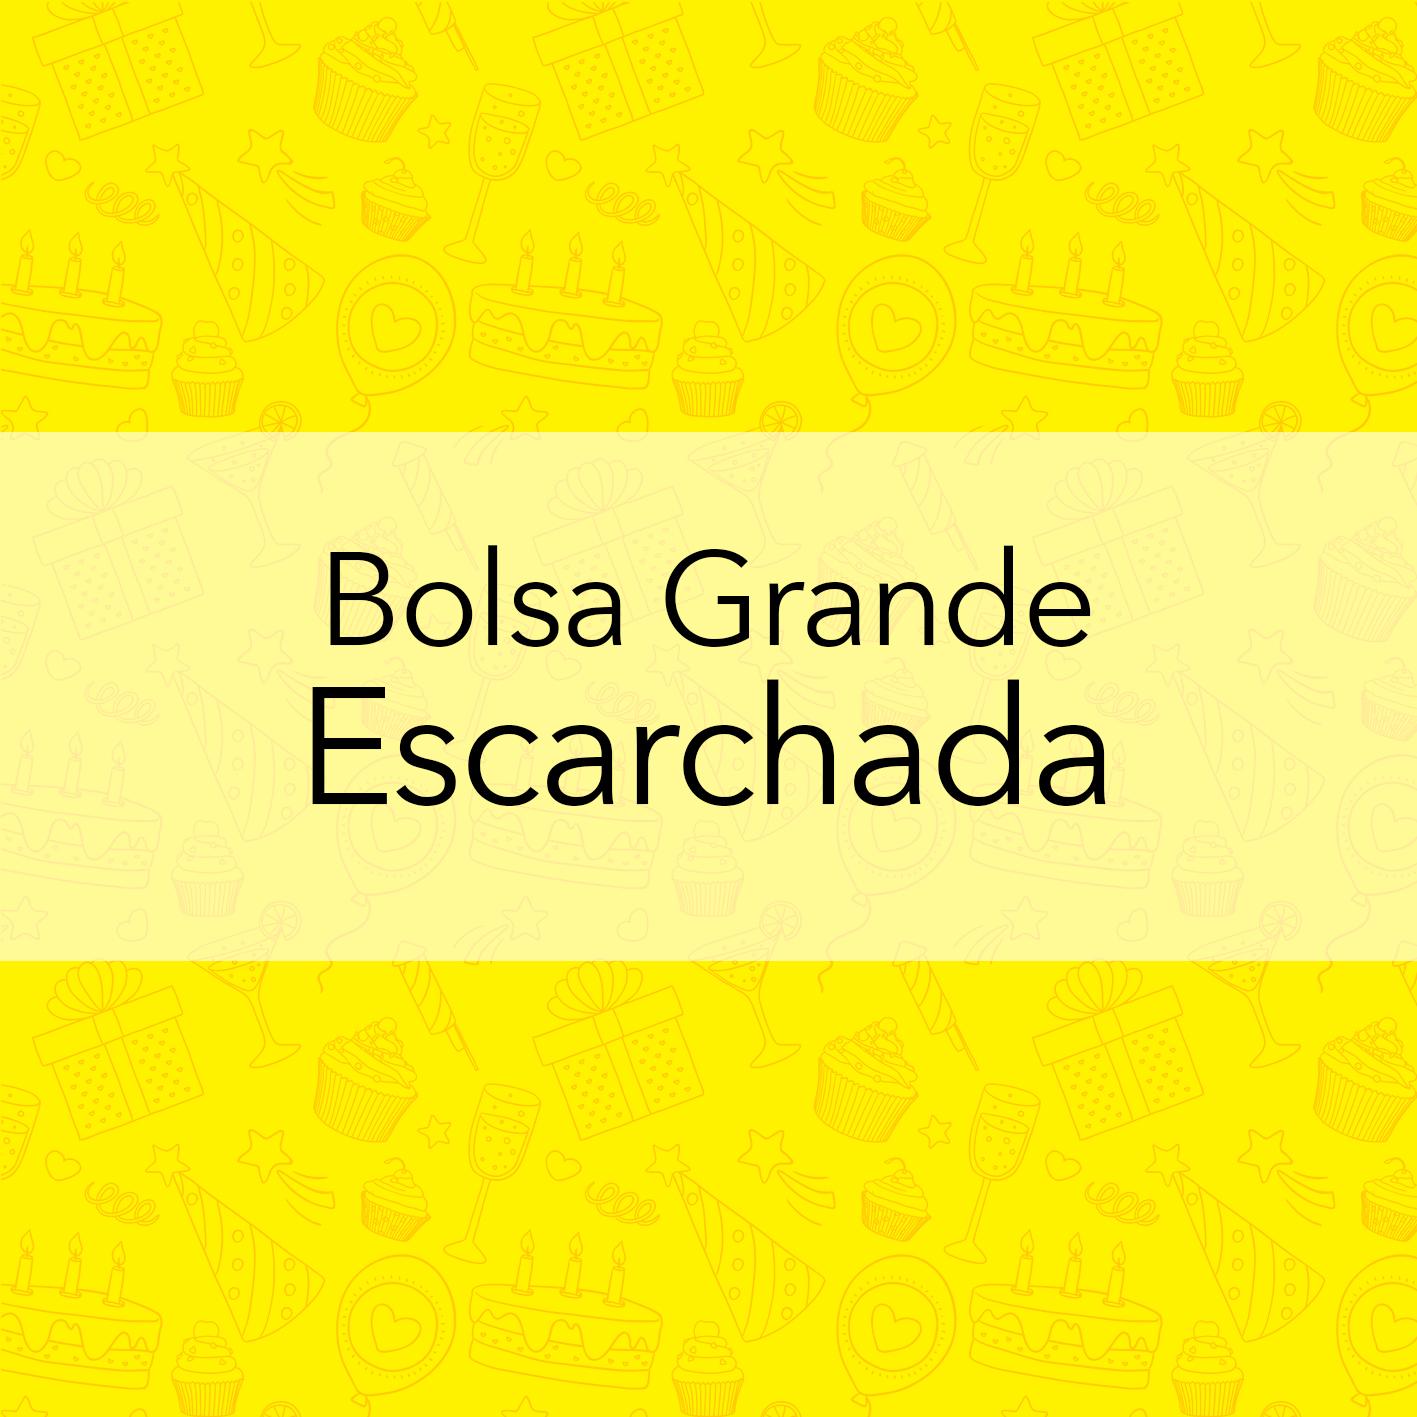 BOLSA GRANDE ESCARCHADA